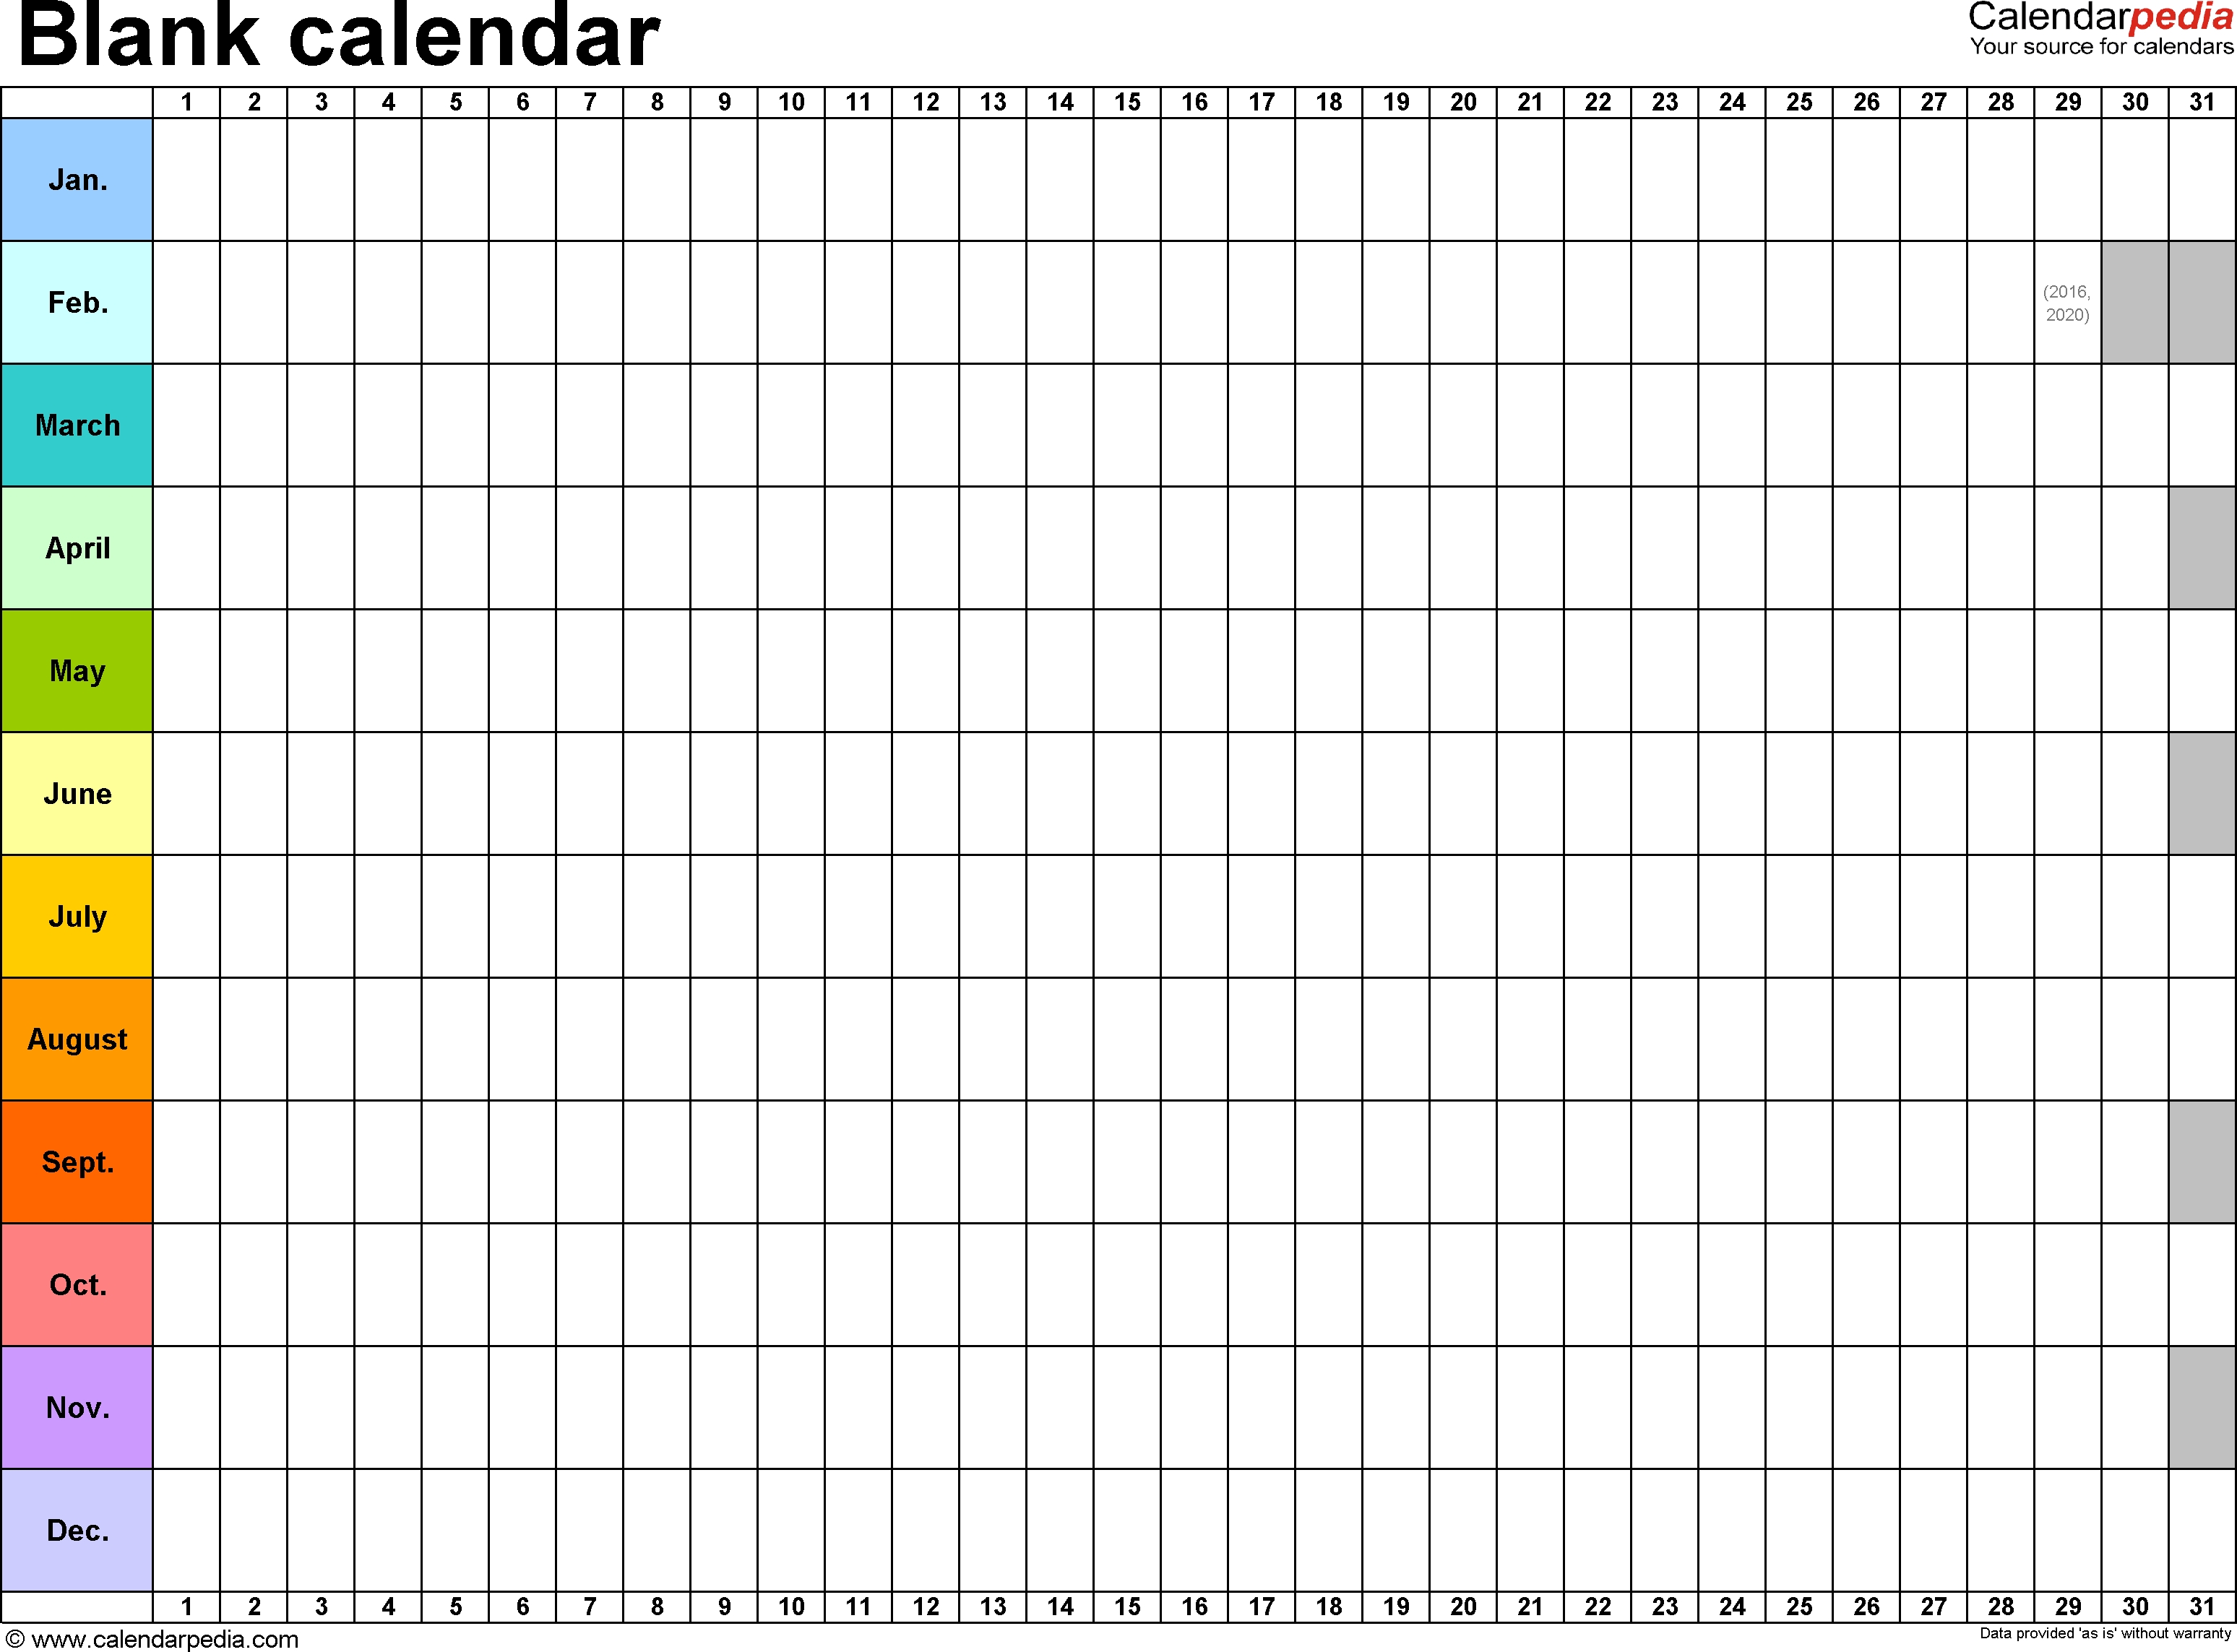 Blank Calendar - 9 Free Printable Microsoft Word Templates within Blank Printable Calendar By Month